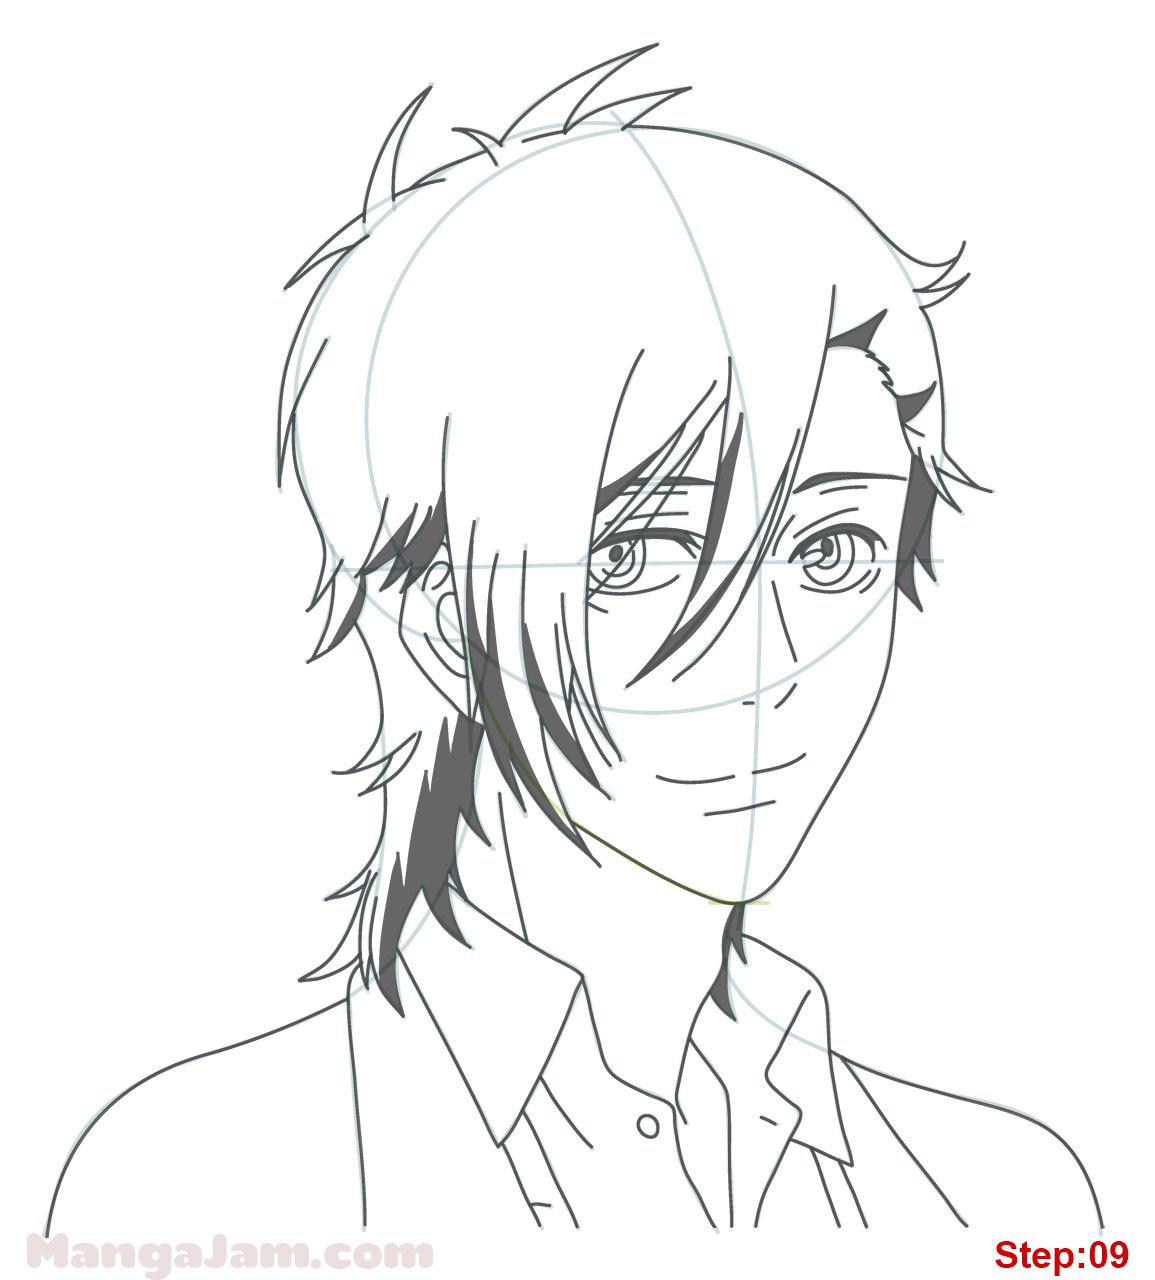 1155x1280 How To Draw Yamato Kurosawa From Say I Love You